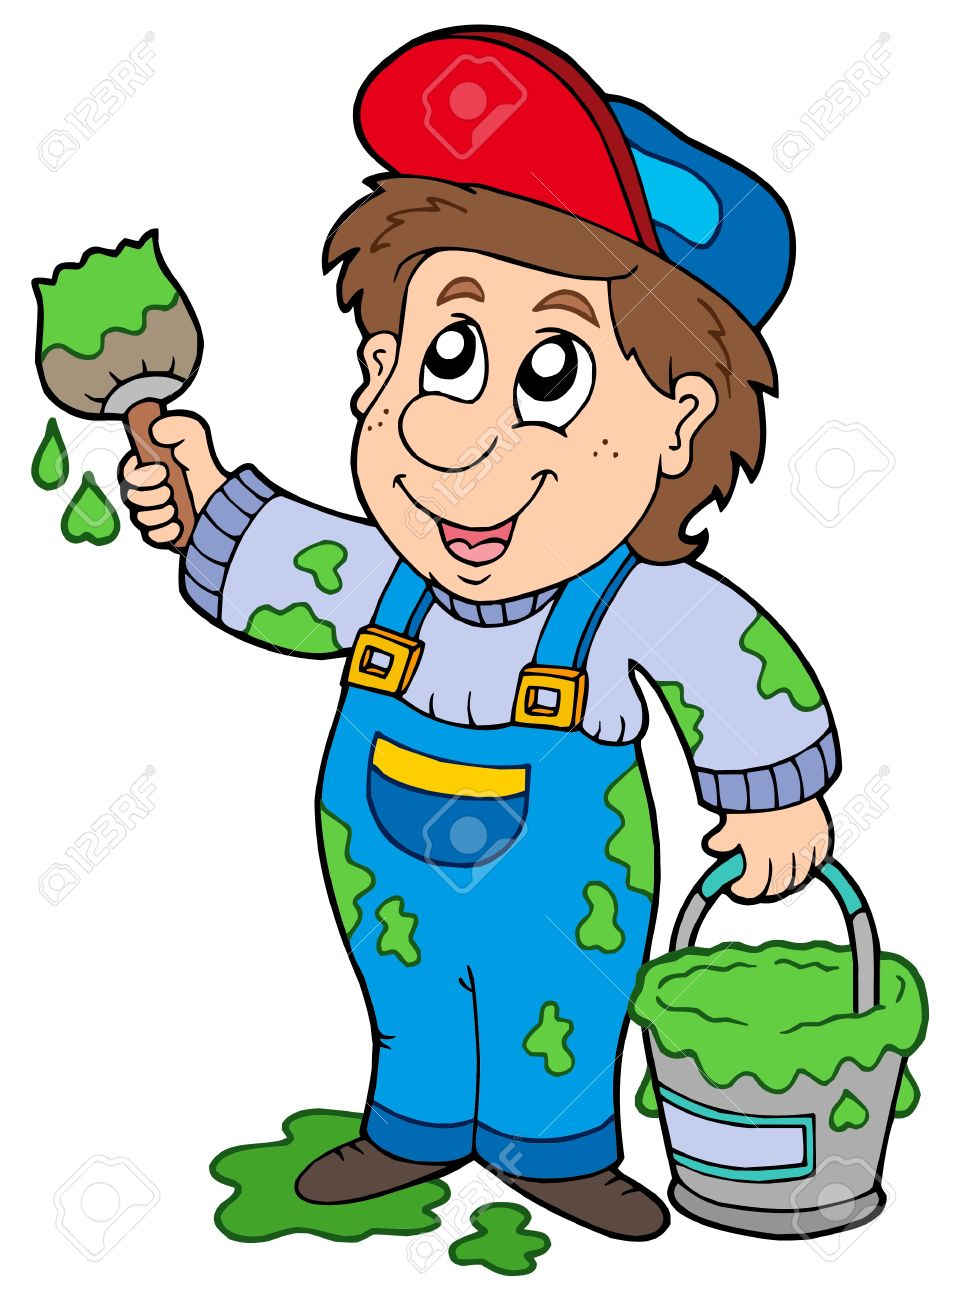 Cartoon house painter - vector illustration. Stock Vector - 6029235